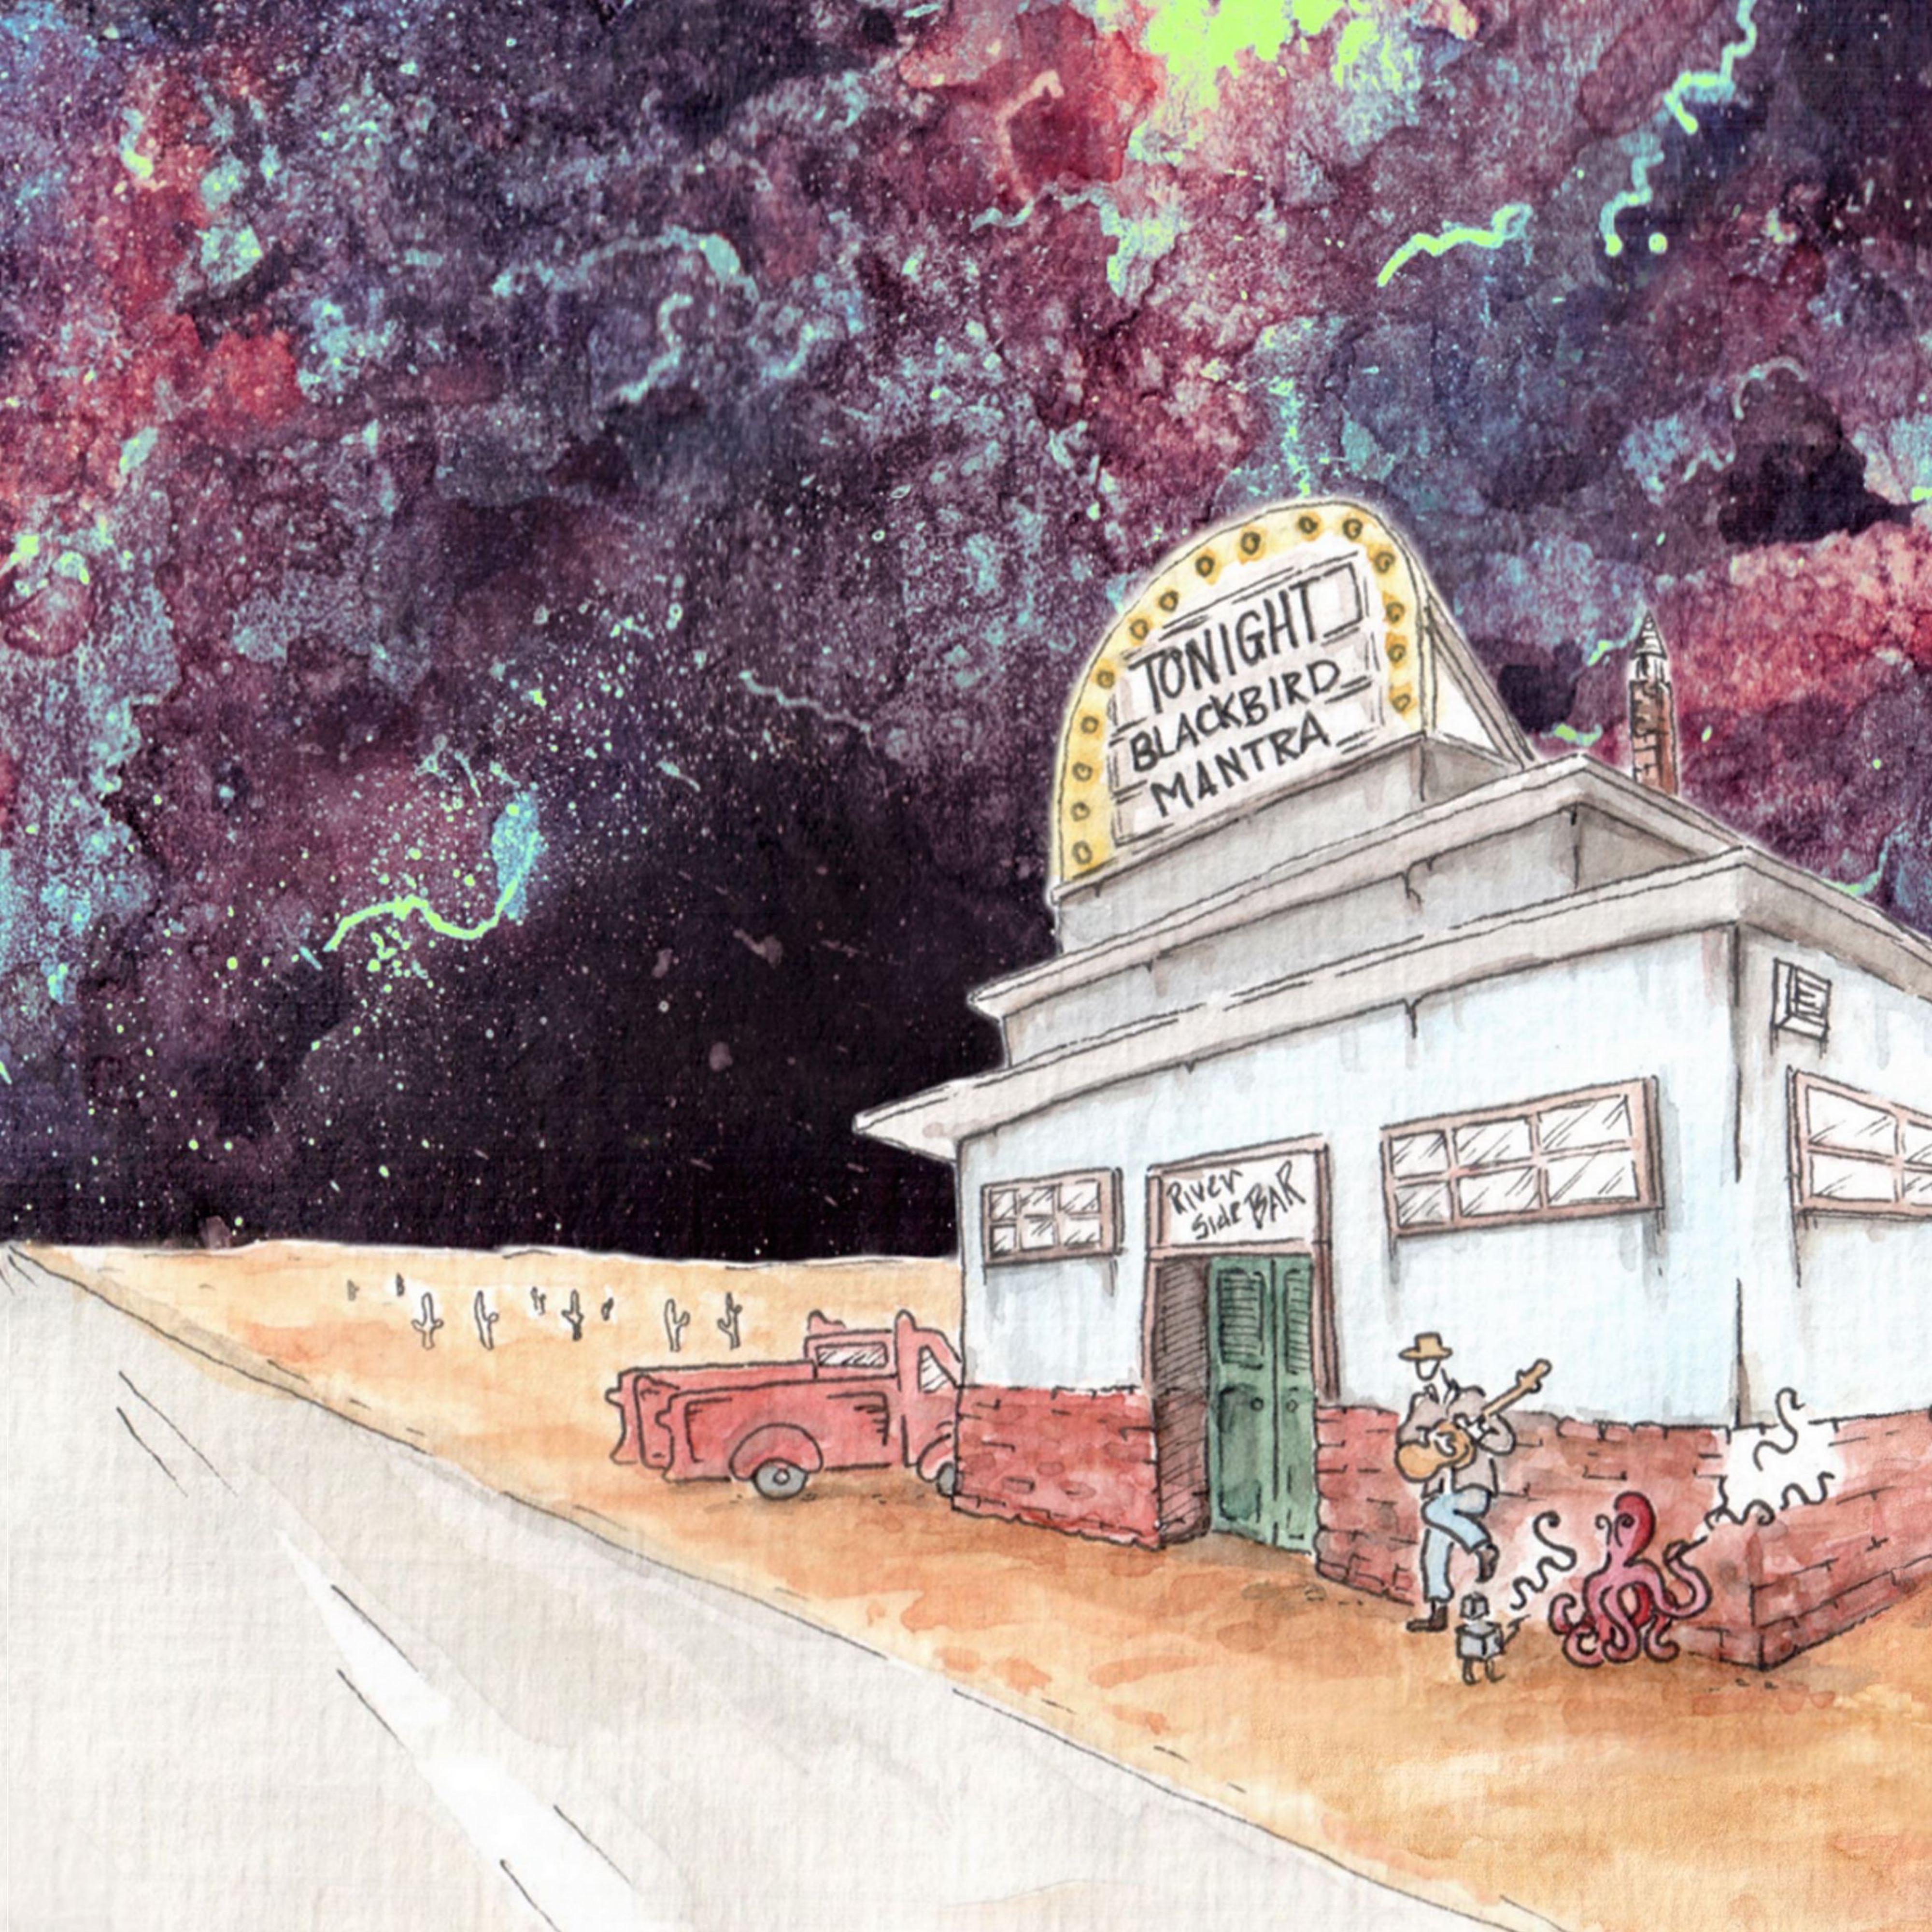 Blackbird Mantra - Riverside Bar